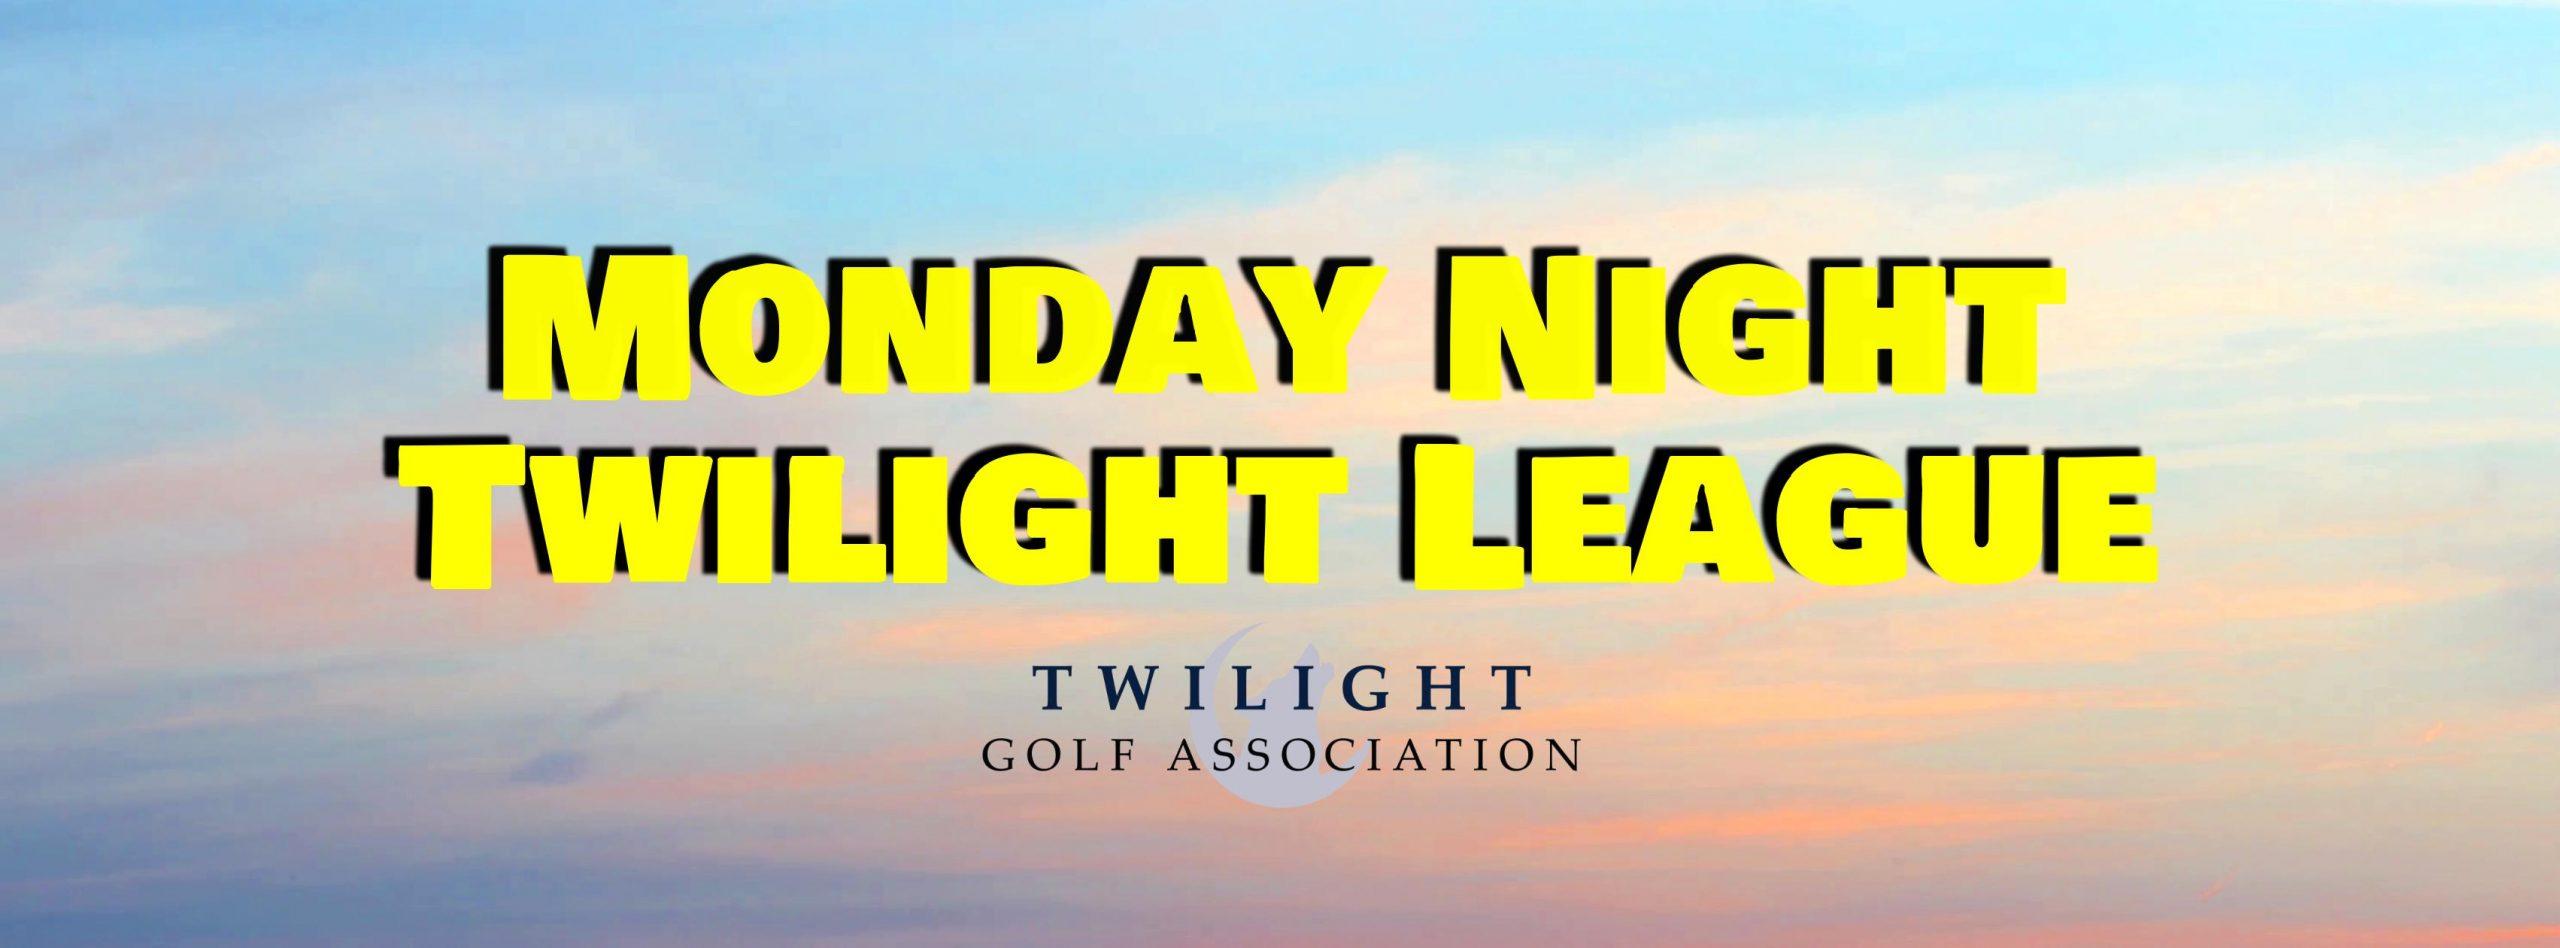 Monday Night Twilight League at Pleasant Valley Golf Club